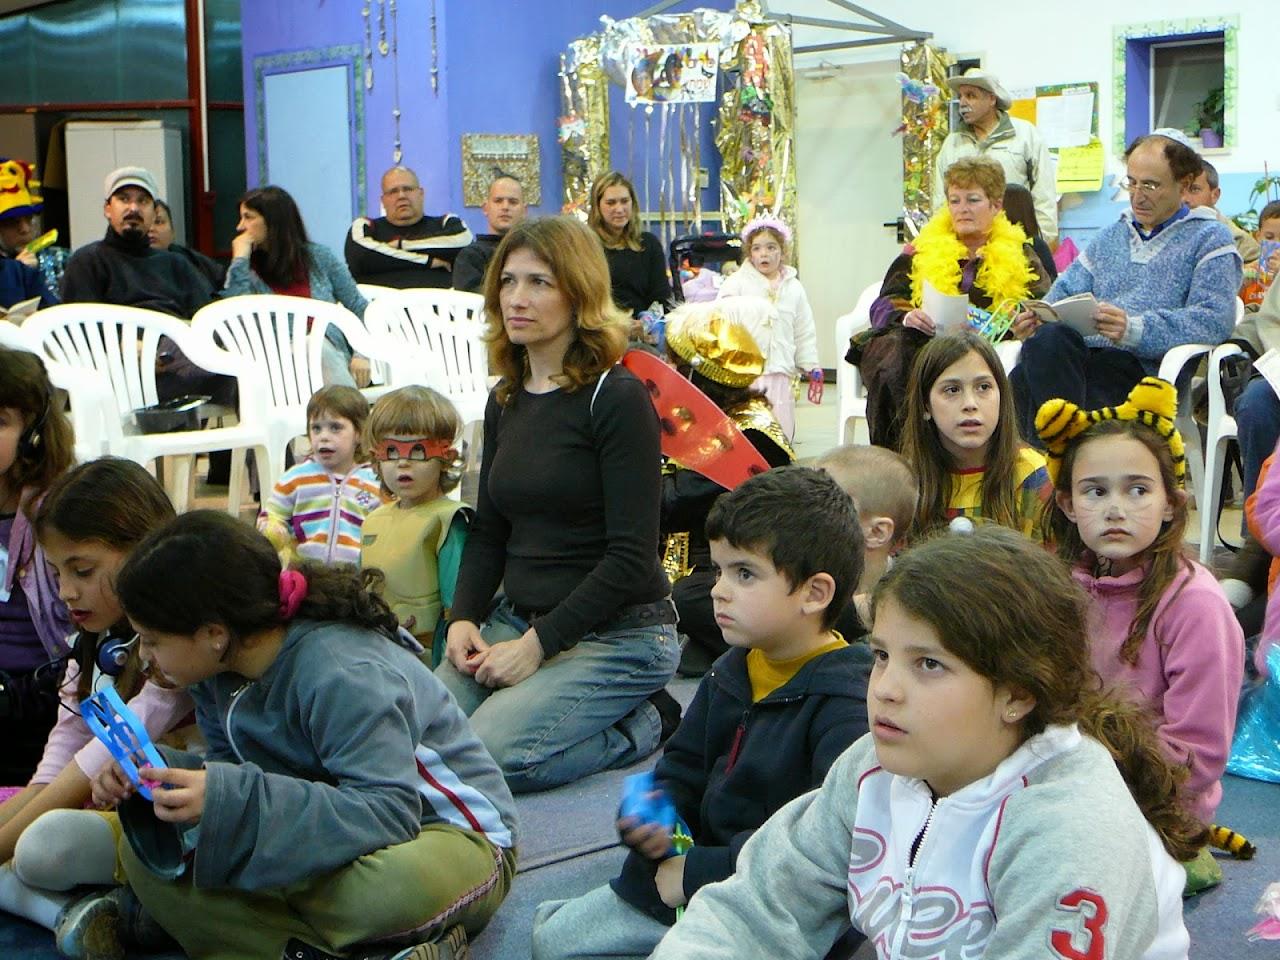 Purim 2007  - 2007-03-03 12.45.18.jpg